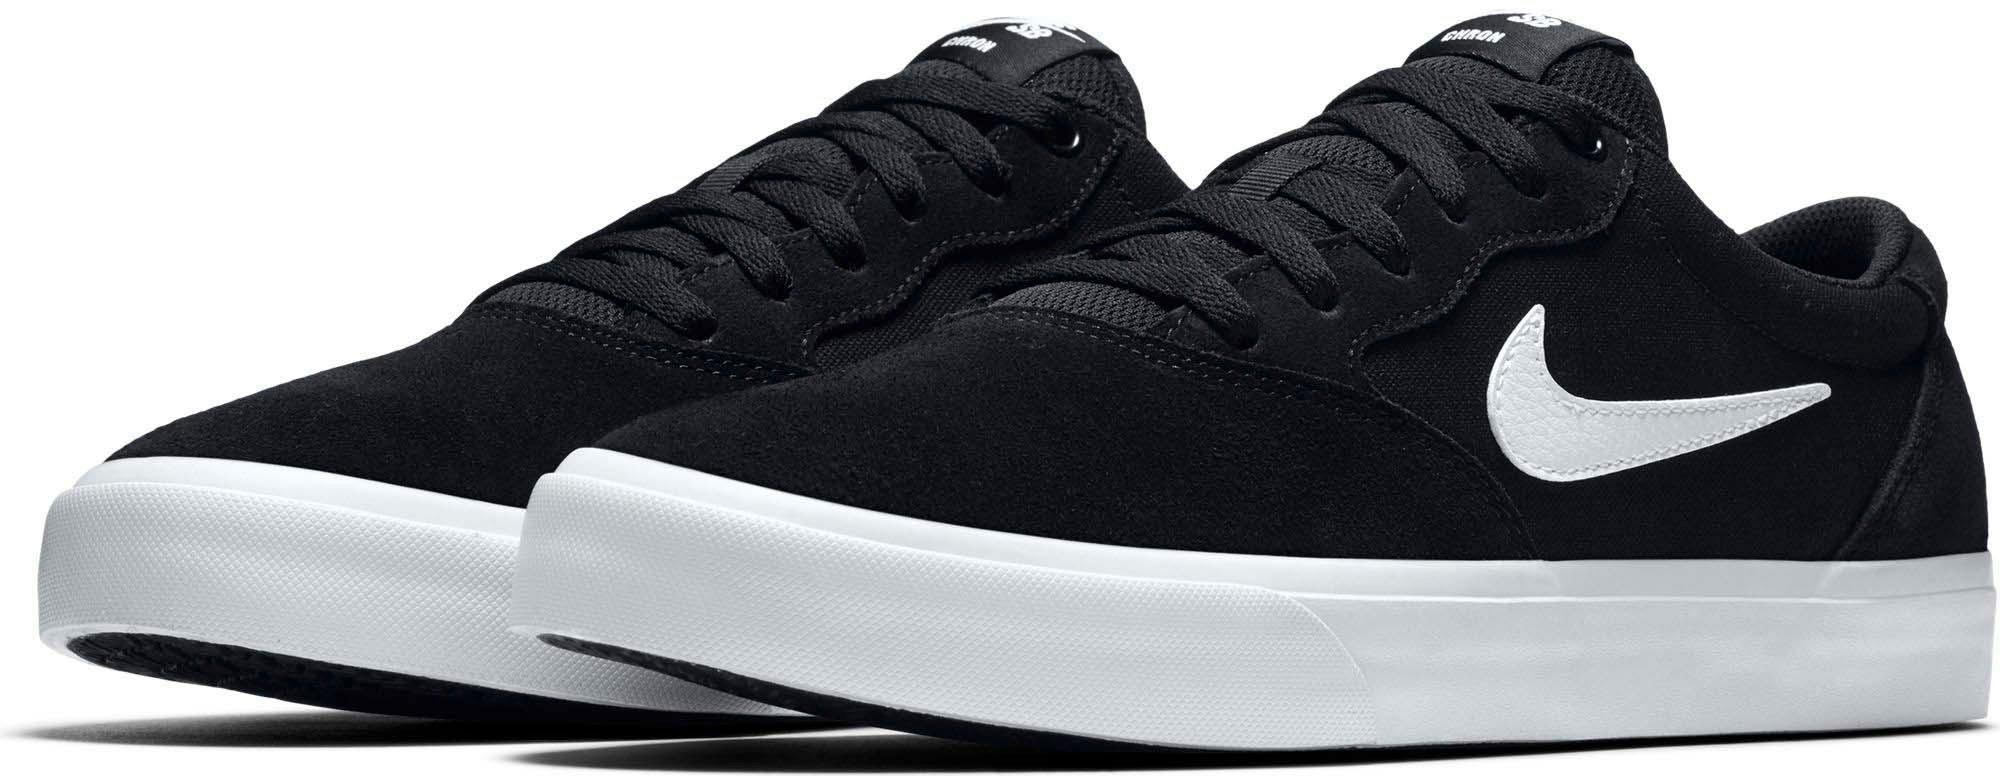 Nike SB sneakers veilig op otto.nl kopen